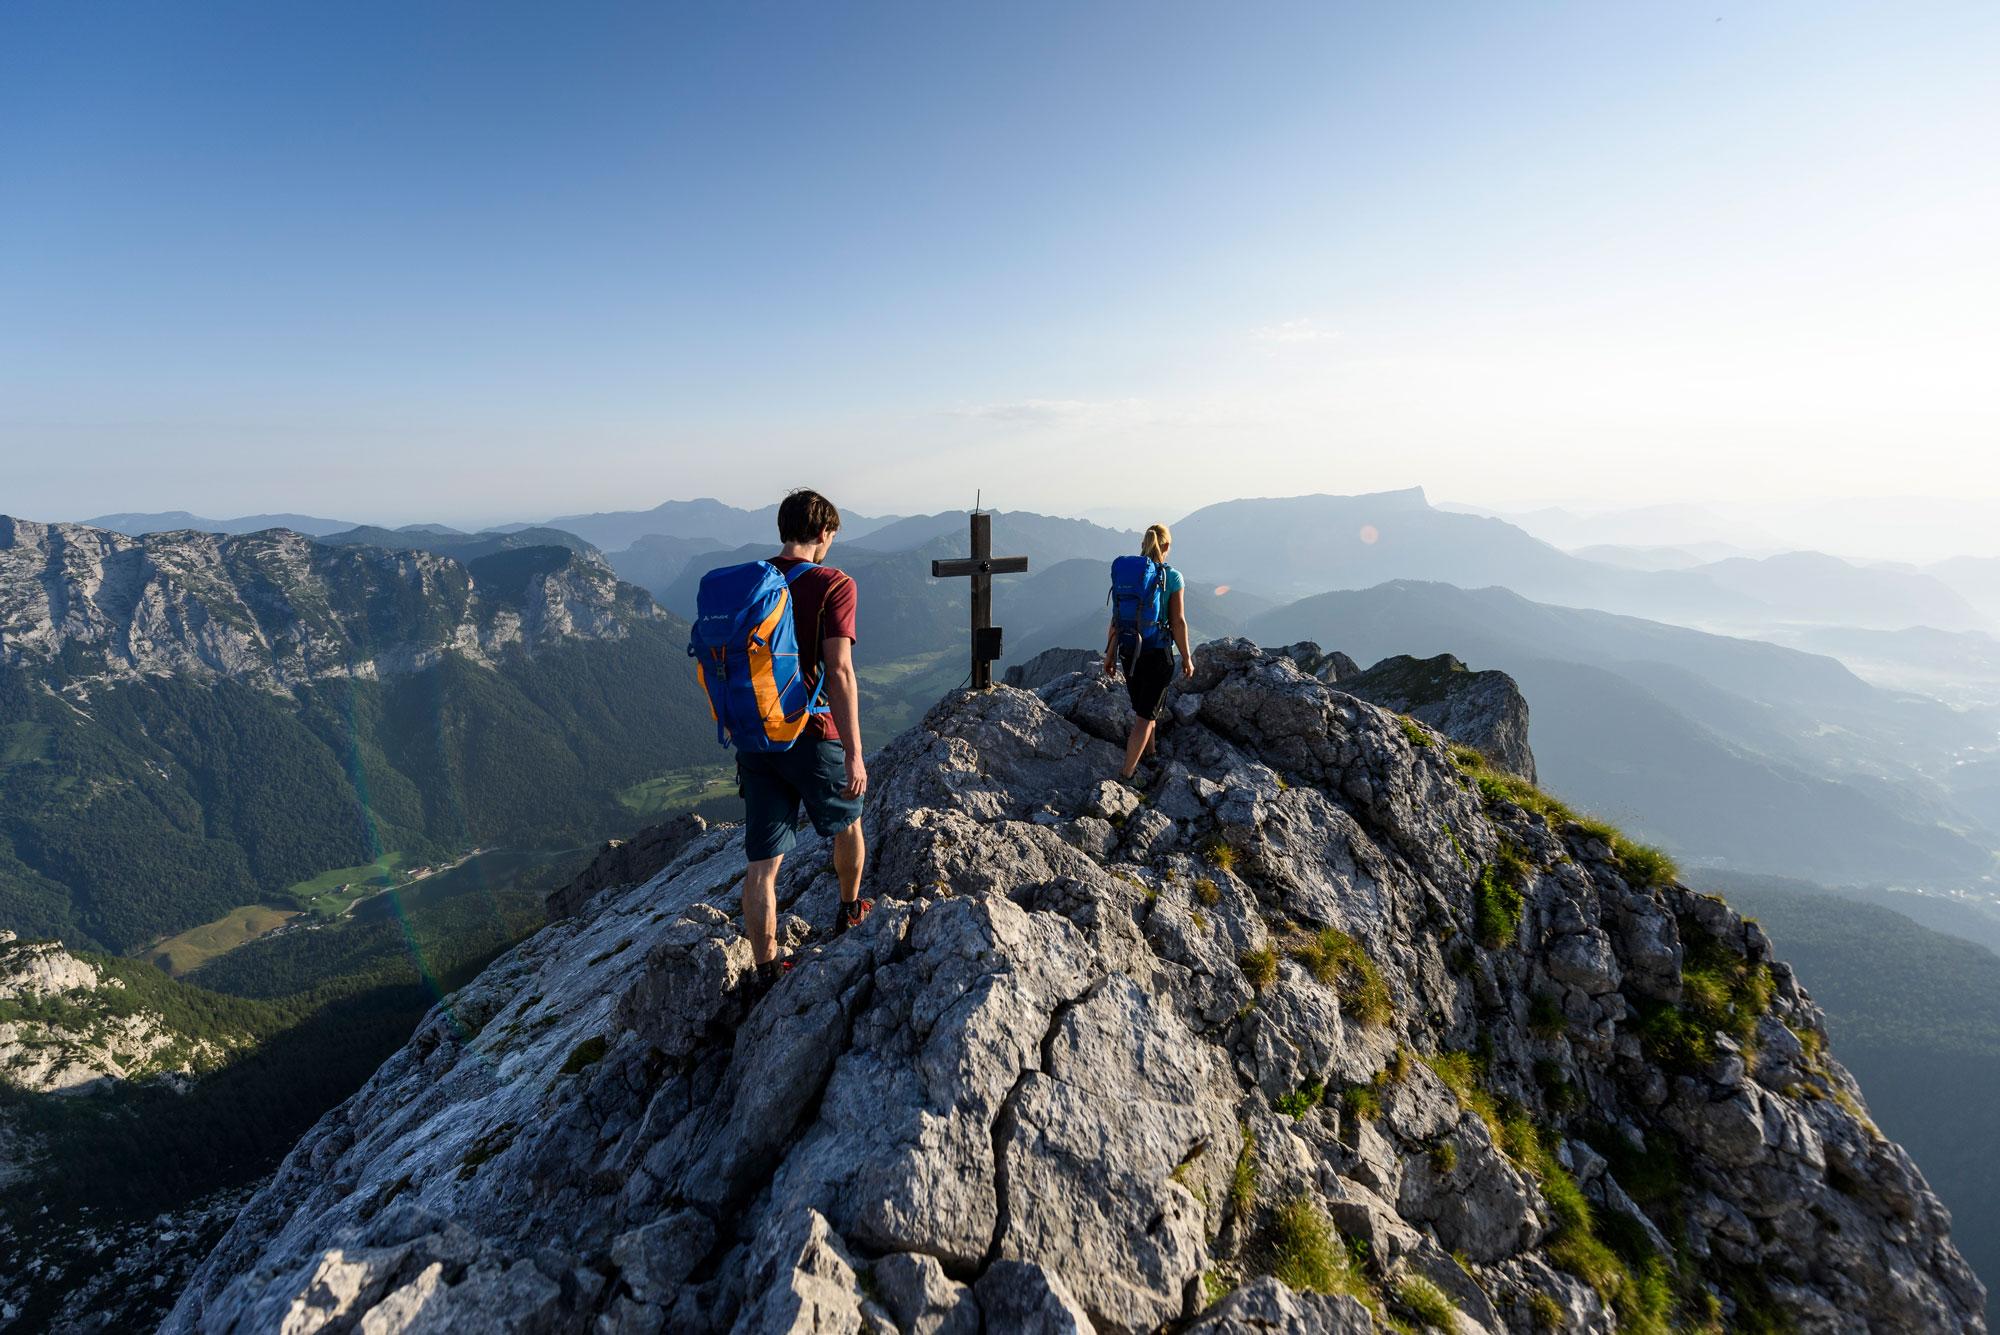 Hoch hinaus zum Gipfelkreuz © DAV/Wolfgang Ehn